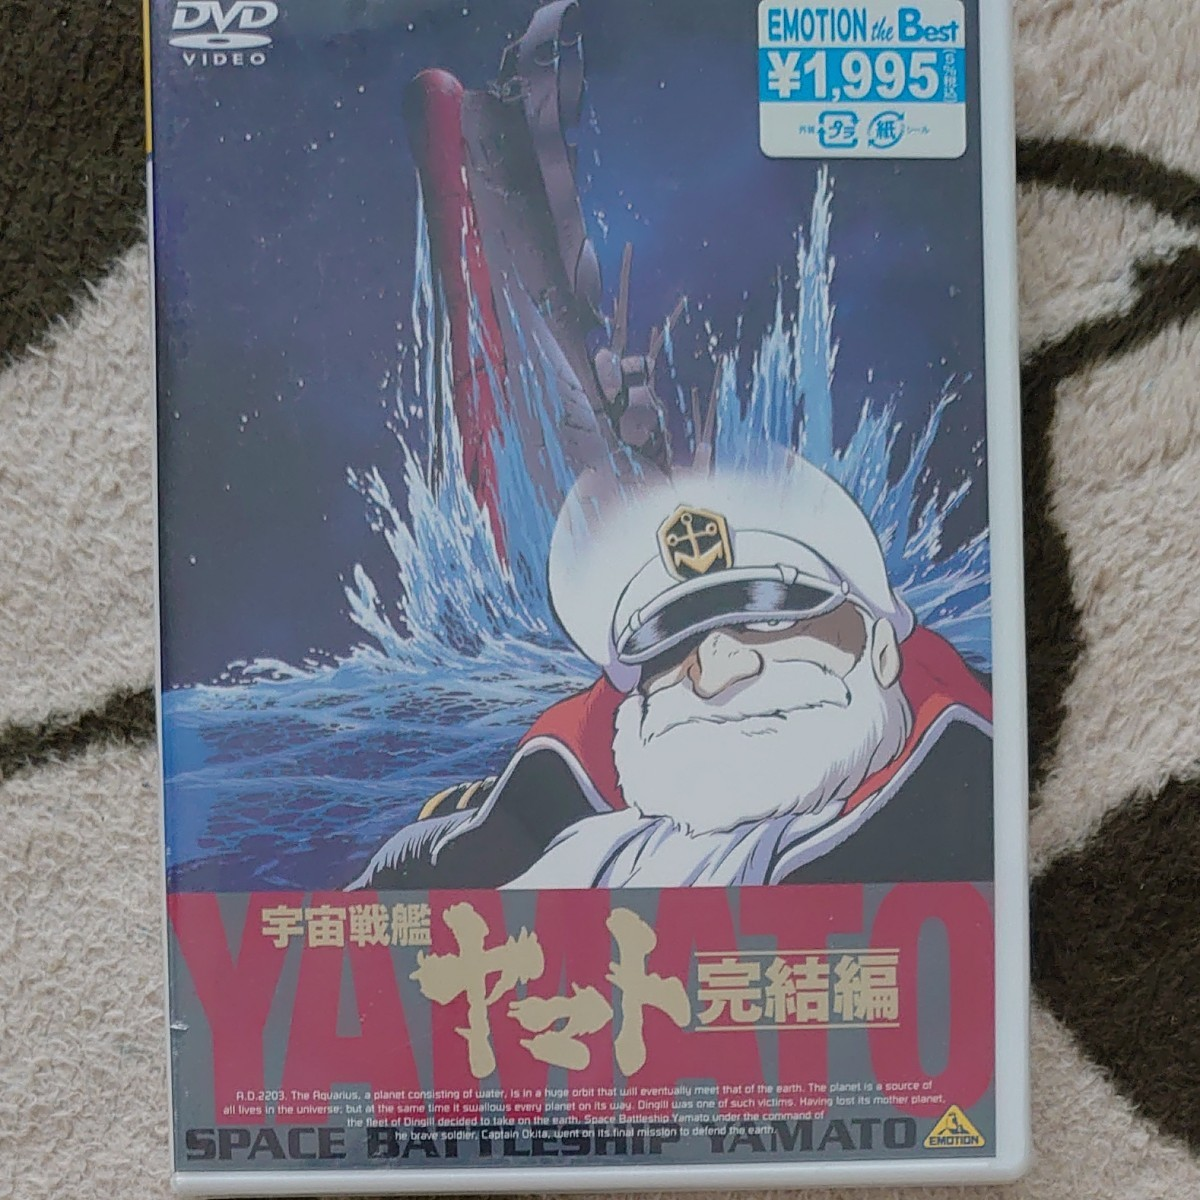 DVD 劇場版 宇宙戦艦ヤマト 全巻セット 松本零士 愛の戦士たち ヤマトよ永遠に 旅立ち DVDセット